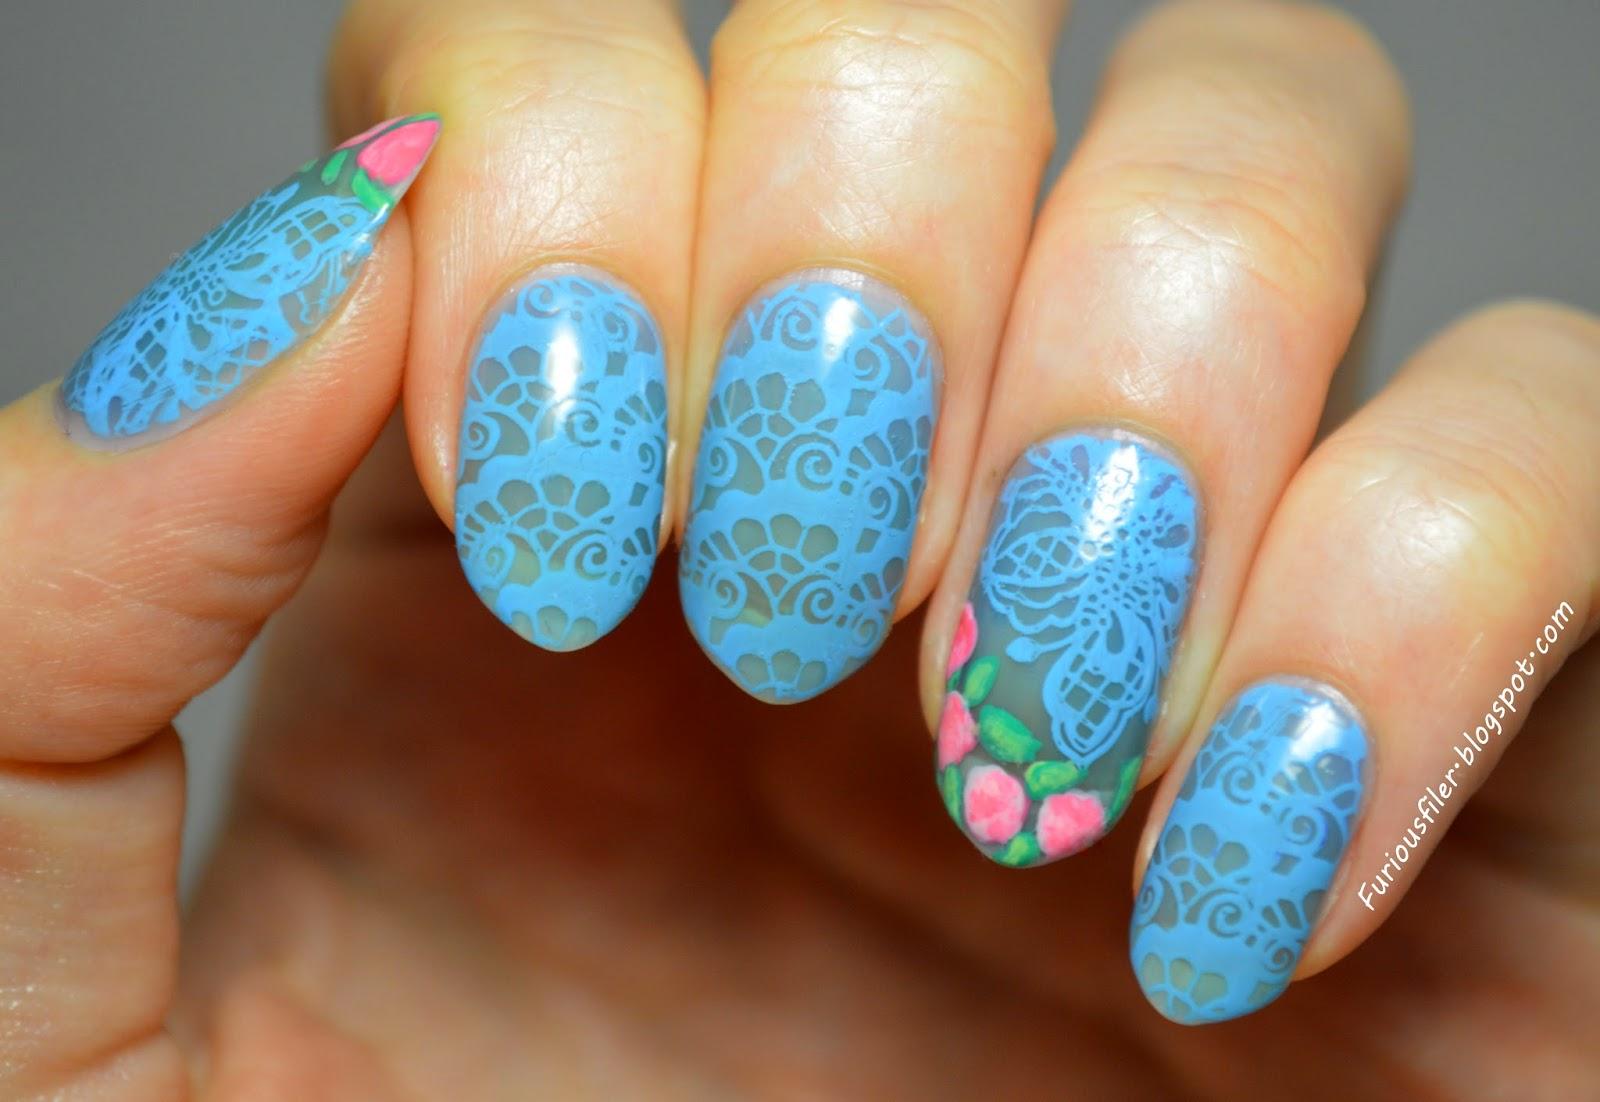 Sheer tint blue lace MoYou bridal